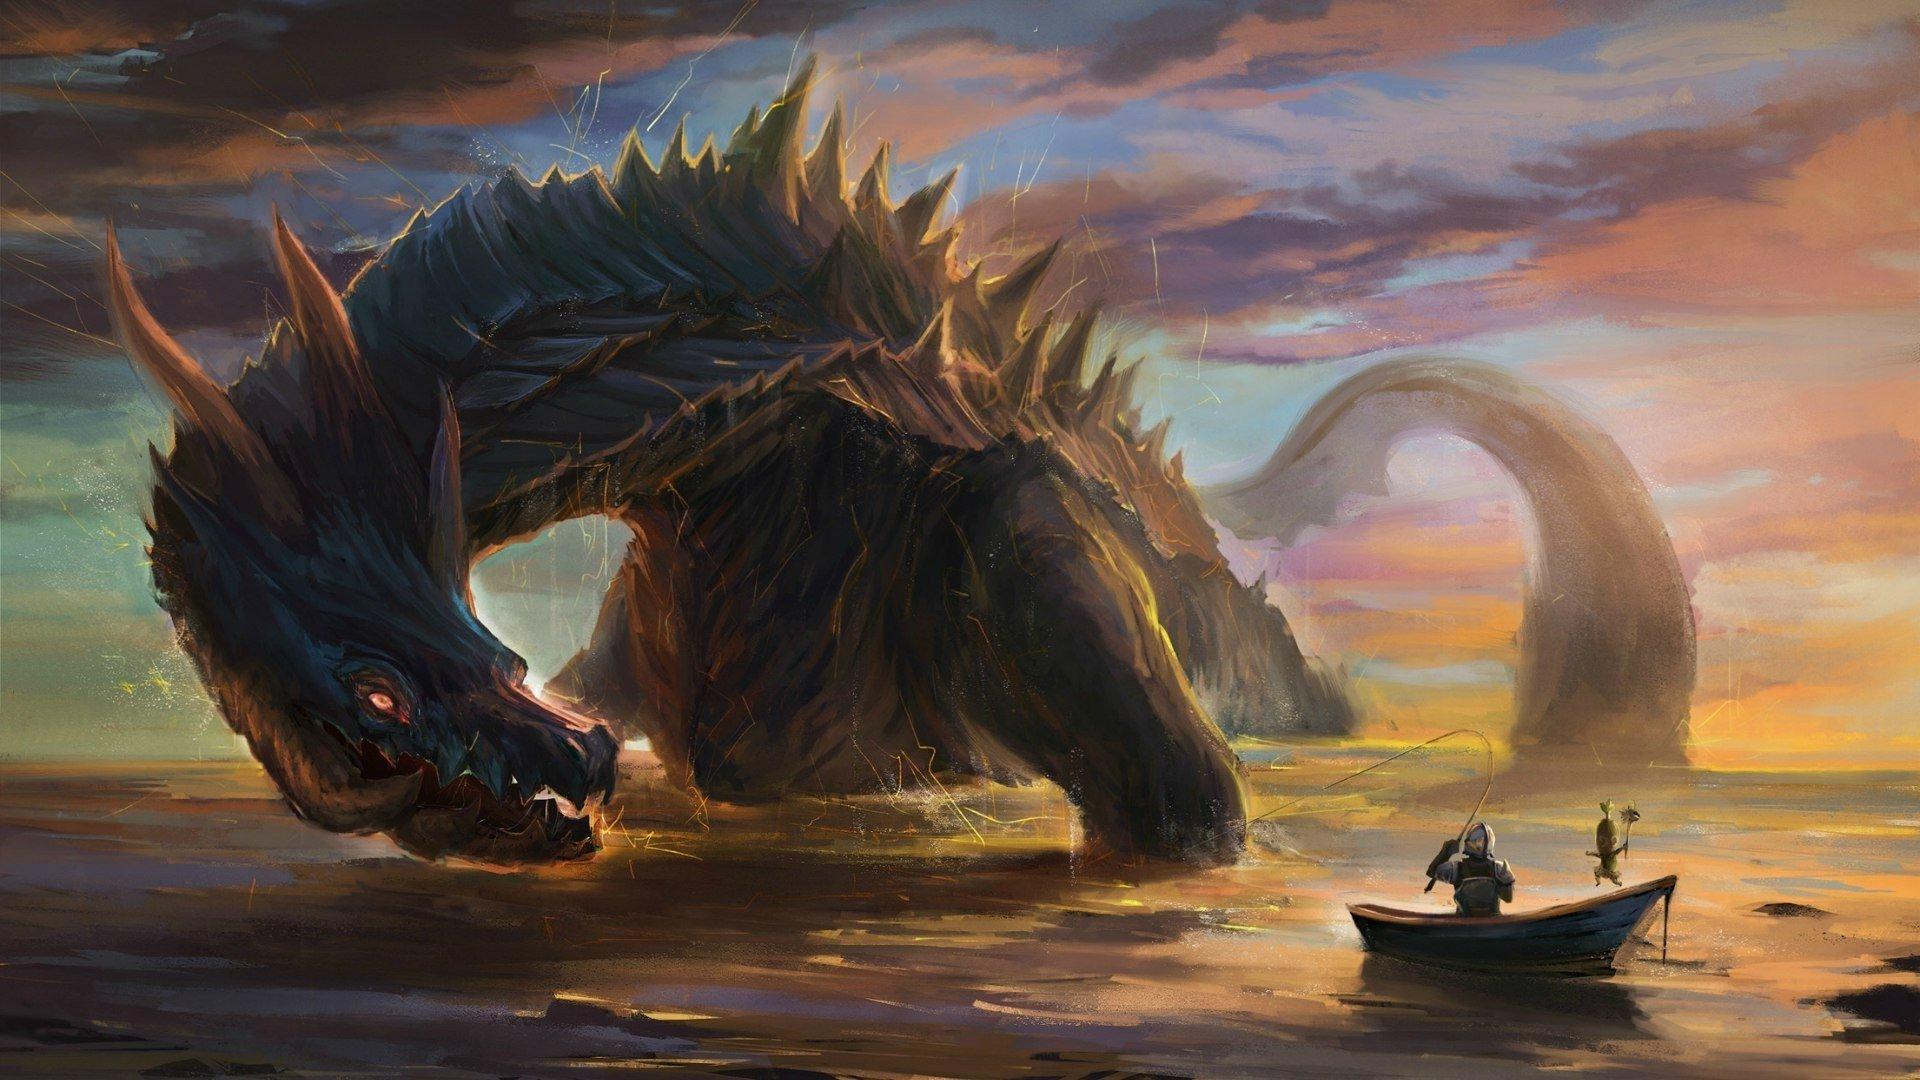 monster hunter online mmo rpg fantasy hunting 1mhf action